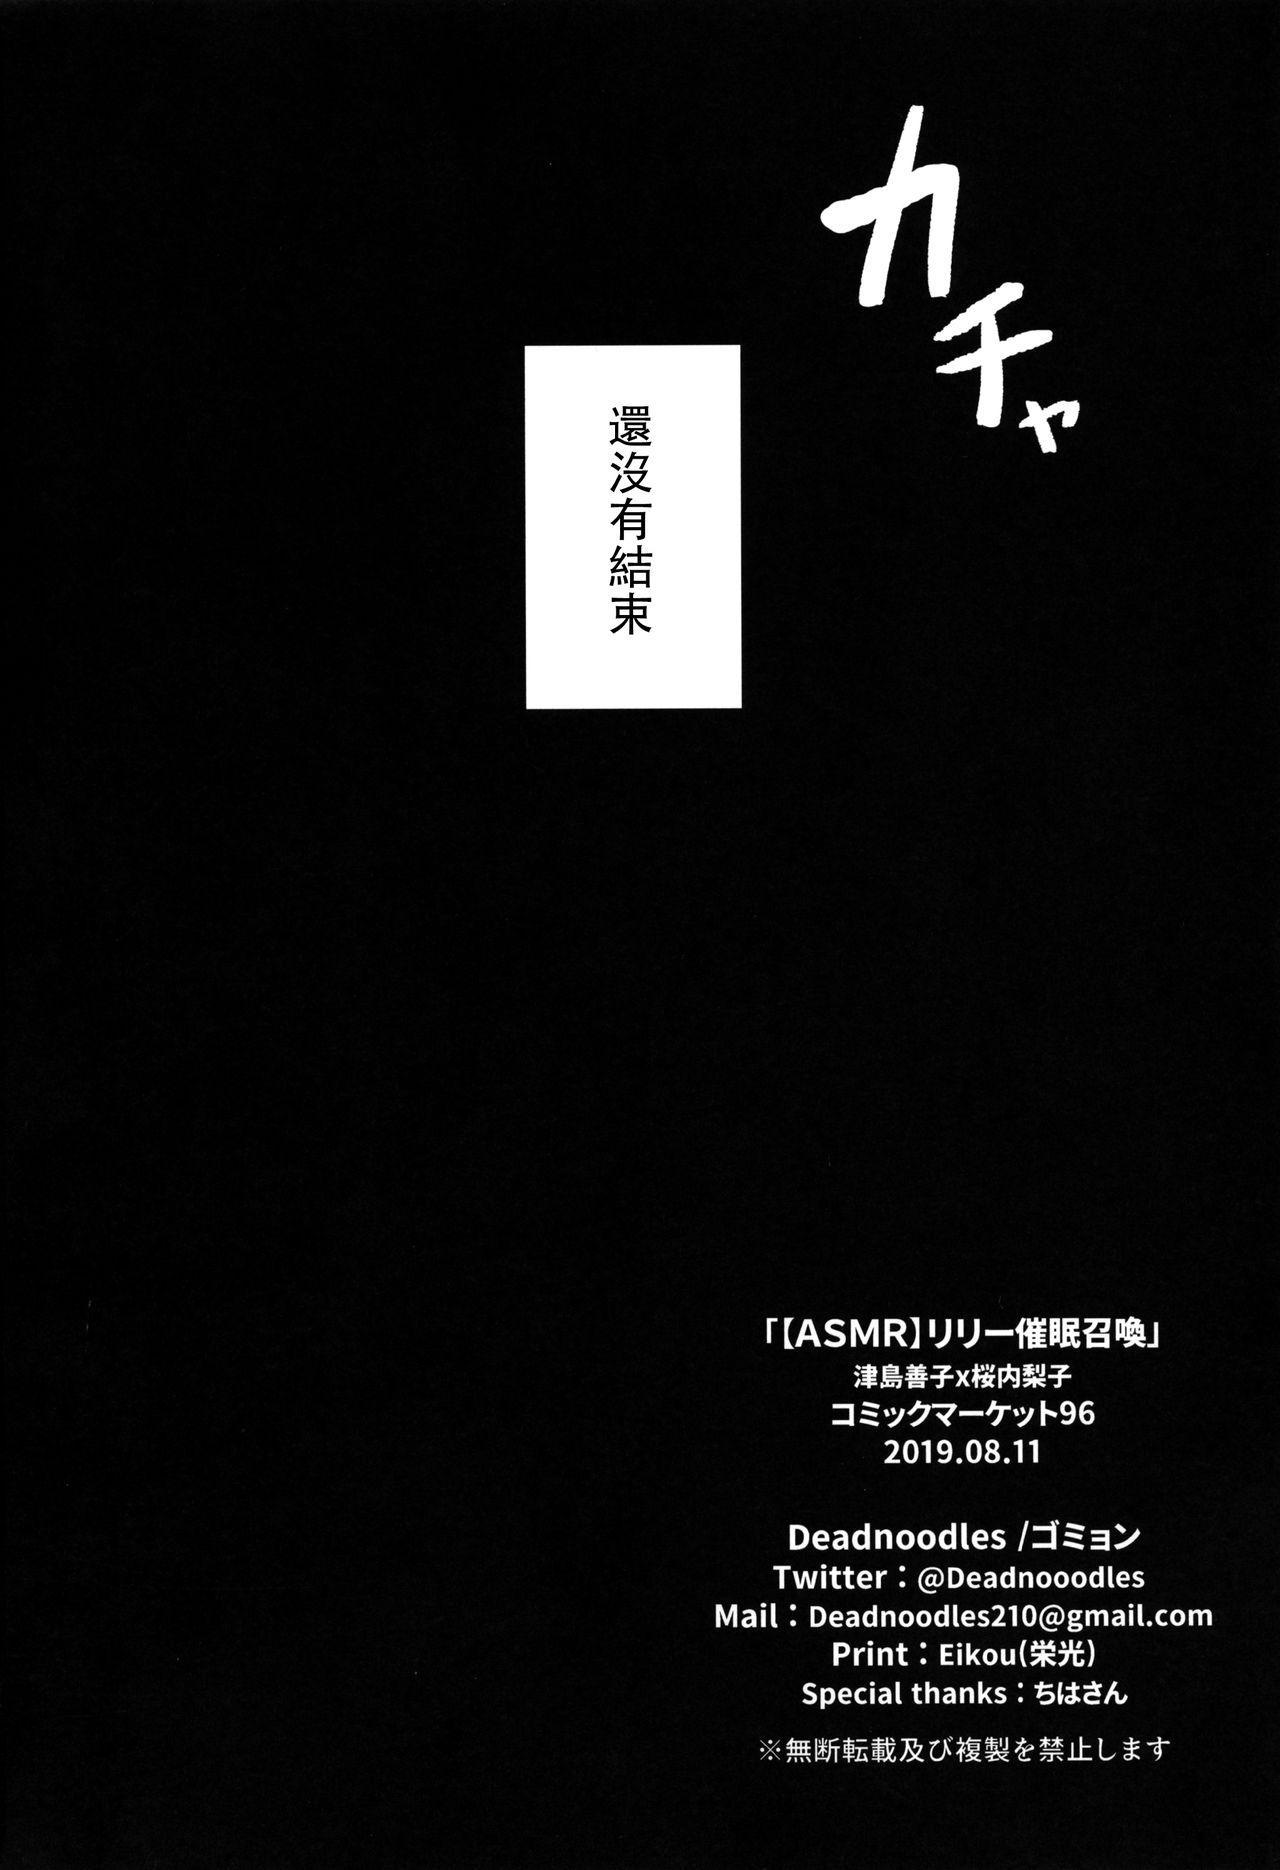 (C96) [Deadnoodles] [ASMR] Lily Saimin Shoukan 丨[ASMR] 莉莉 催眠召喚 (Love Live! Sunshine!!) [Chinese] [沒有漢化] 33